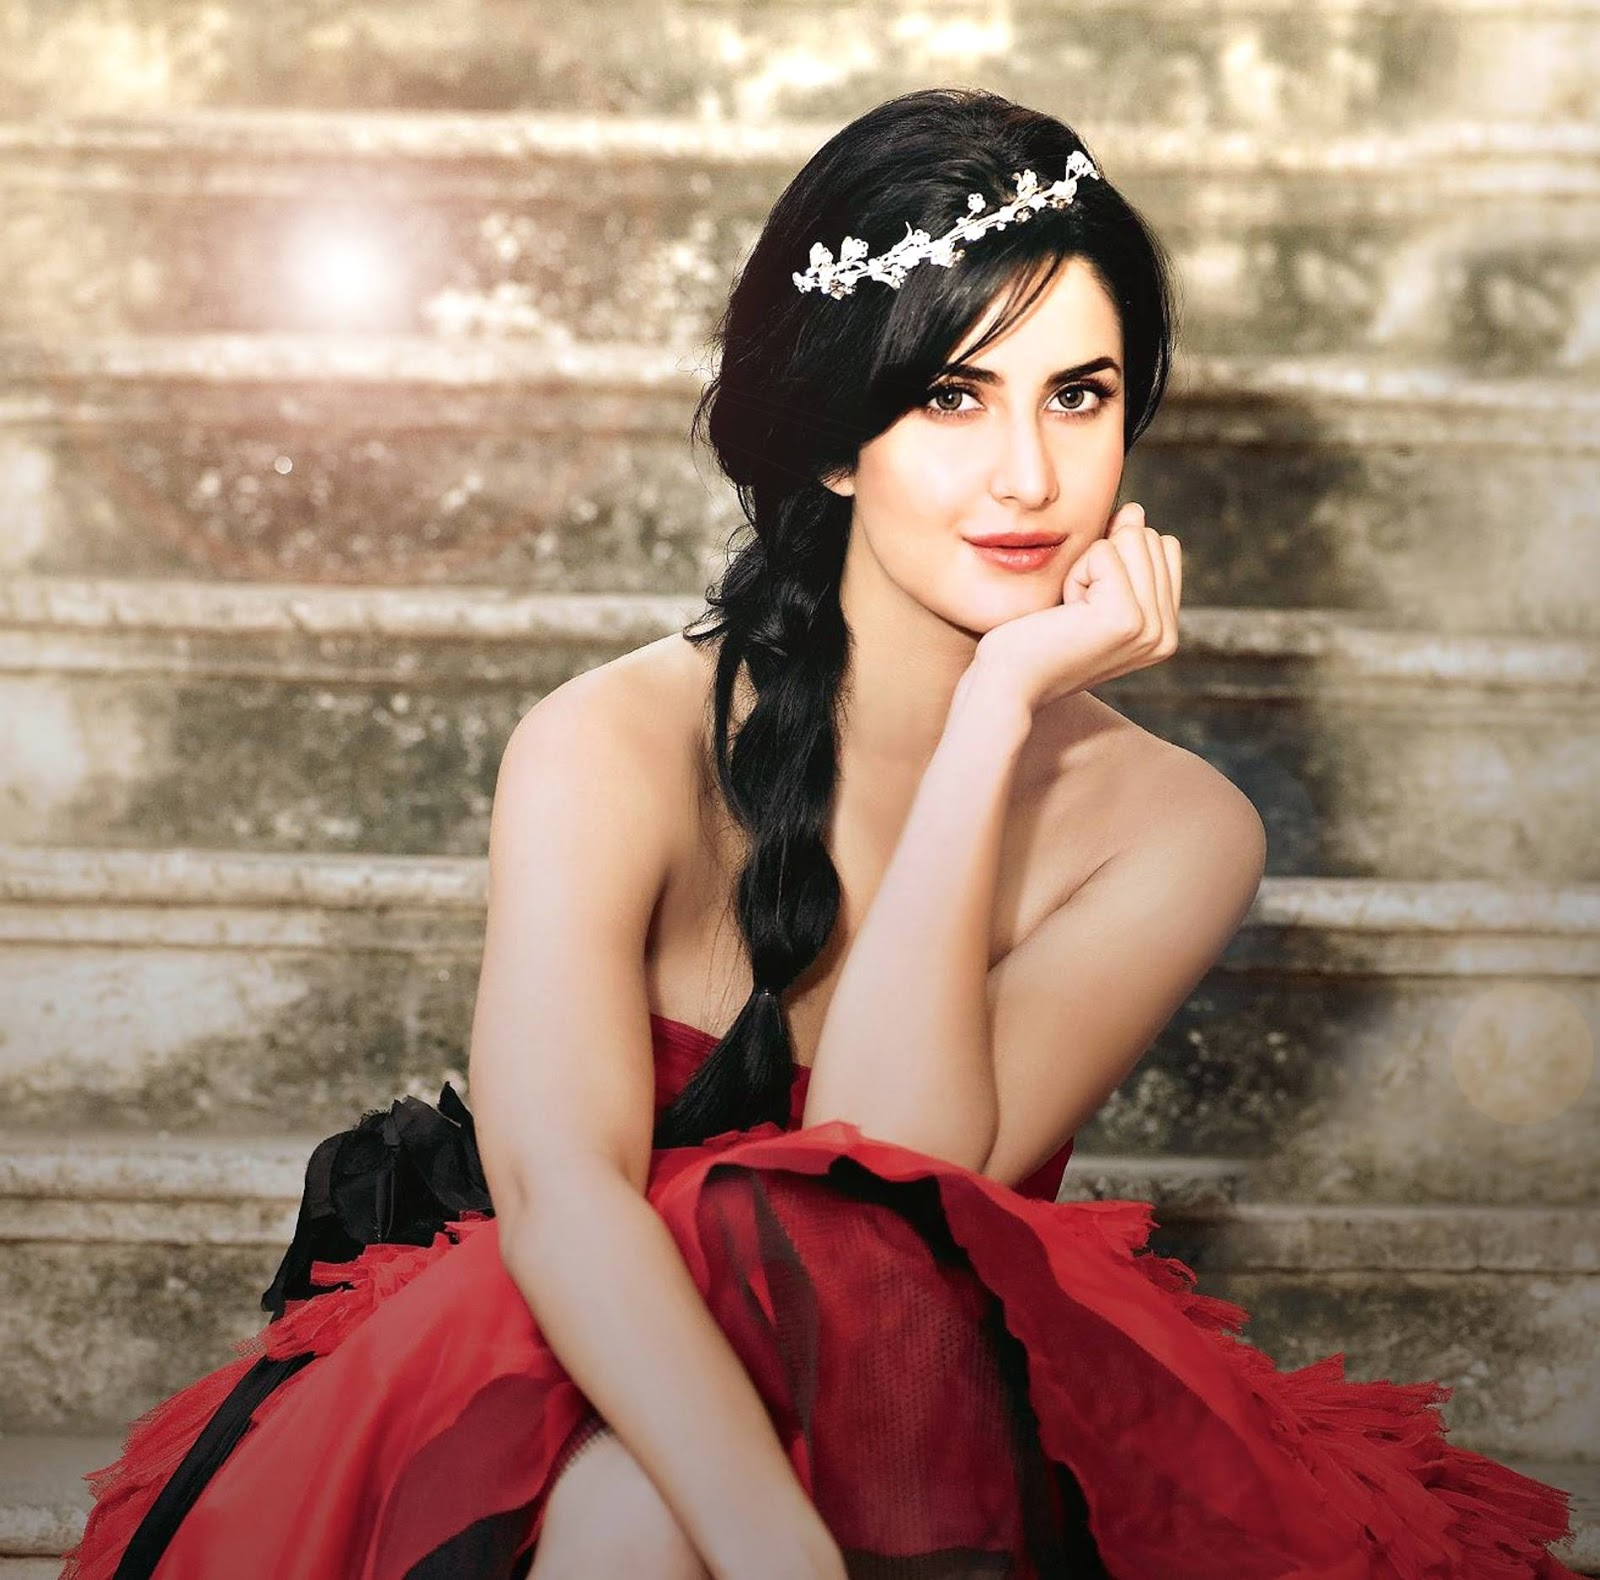 Katrina Kaif Dp Profile Pics - Whatsapp Images